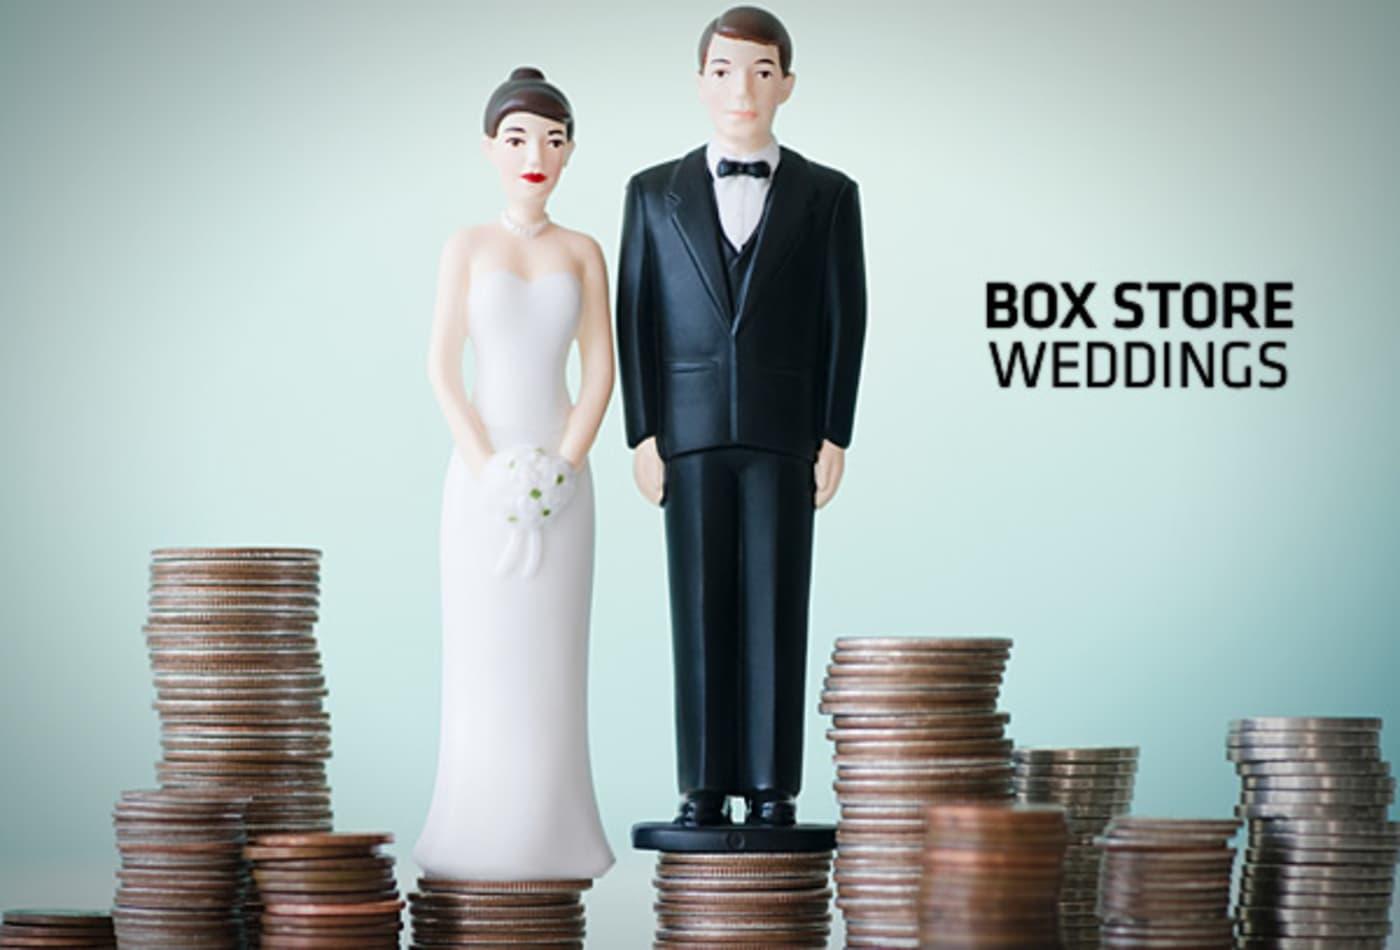 cosco-wedding-cover.jpg